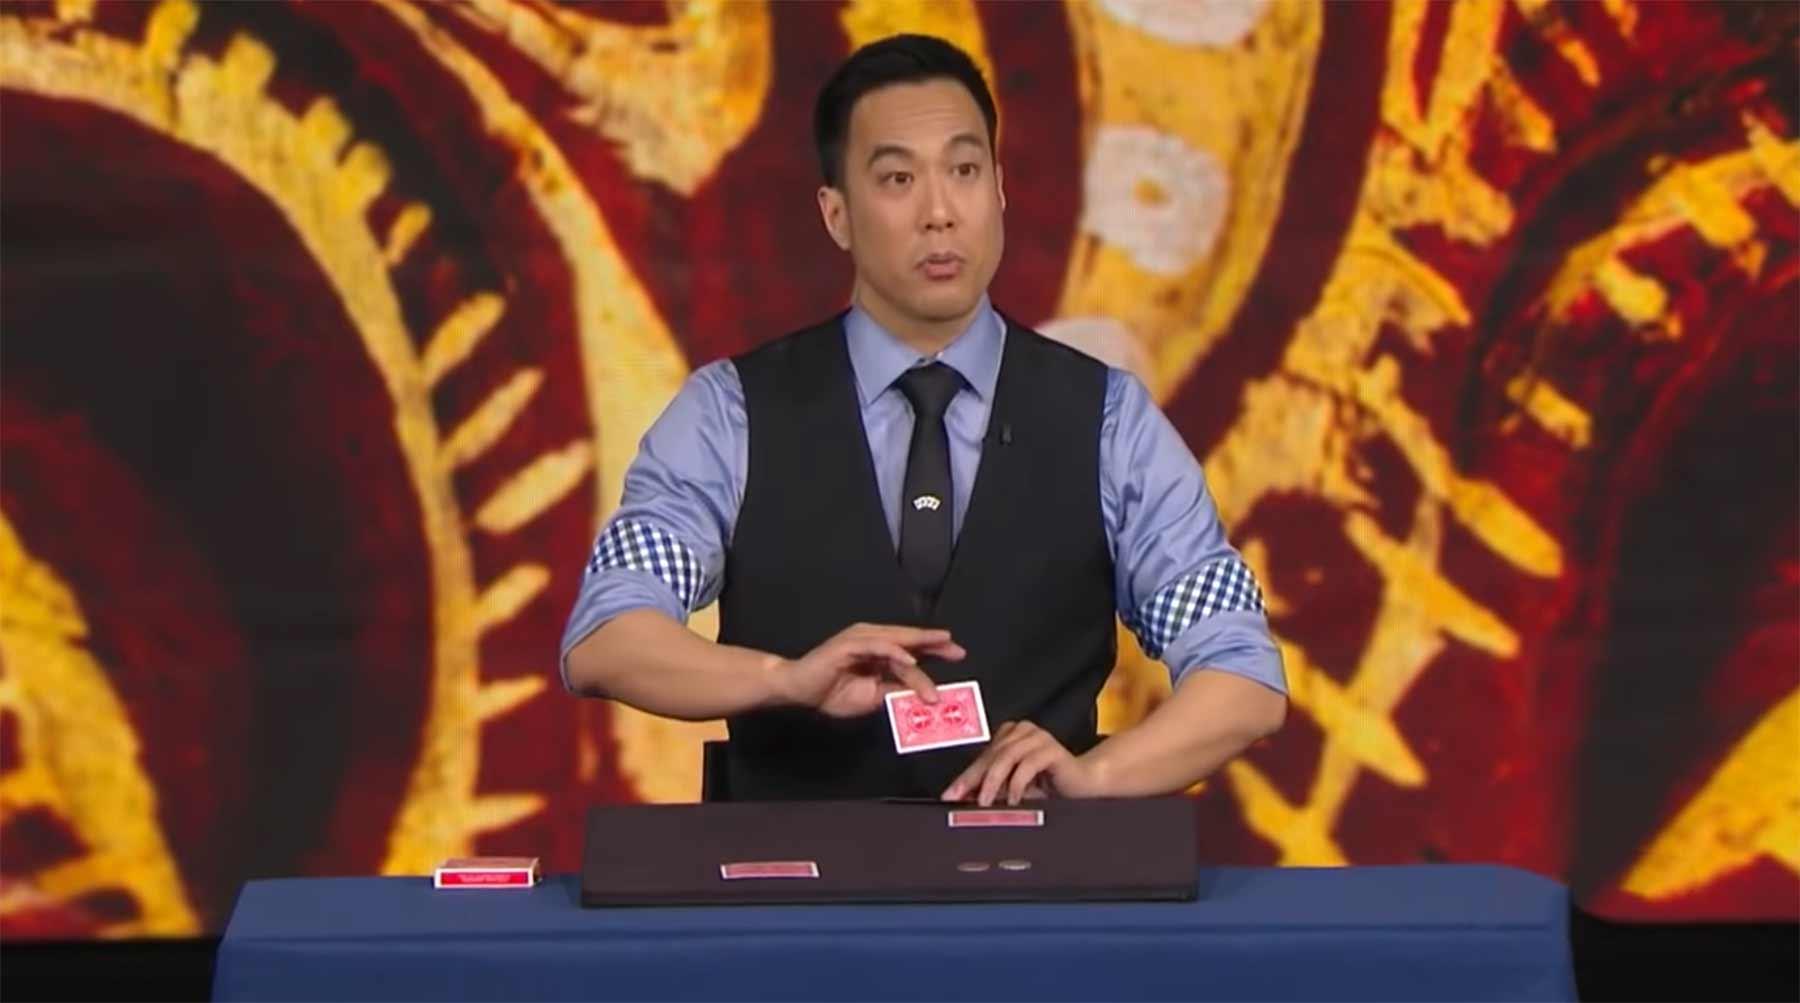 Ryan Hayashis unglaublicher Münzen-Trick Ryan-Hayashi-FOOLS-Penn-and-Teller-IMPOSSIBLE-Coin-Magic-Trick